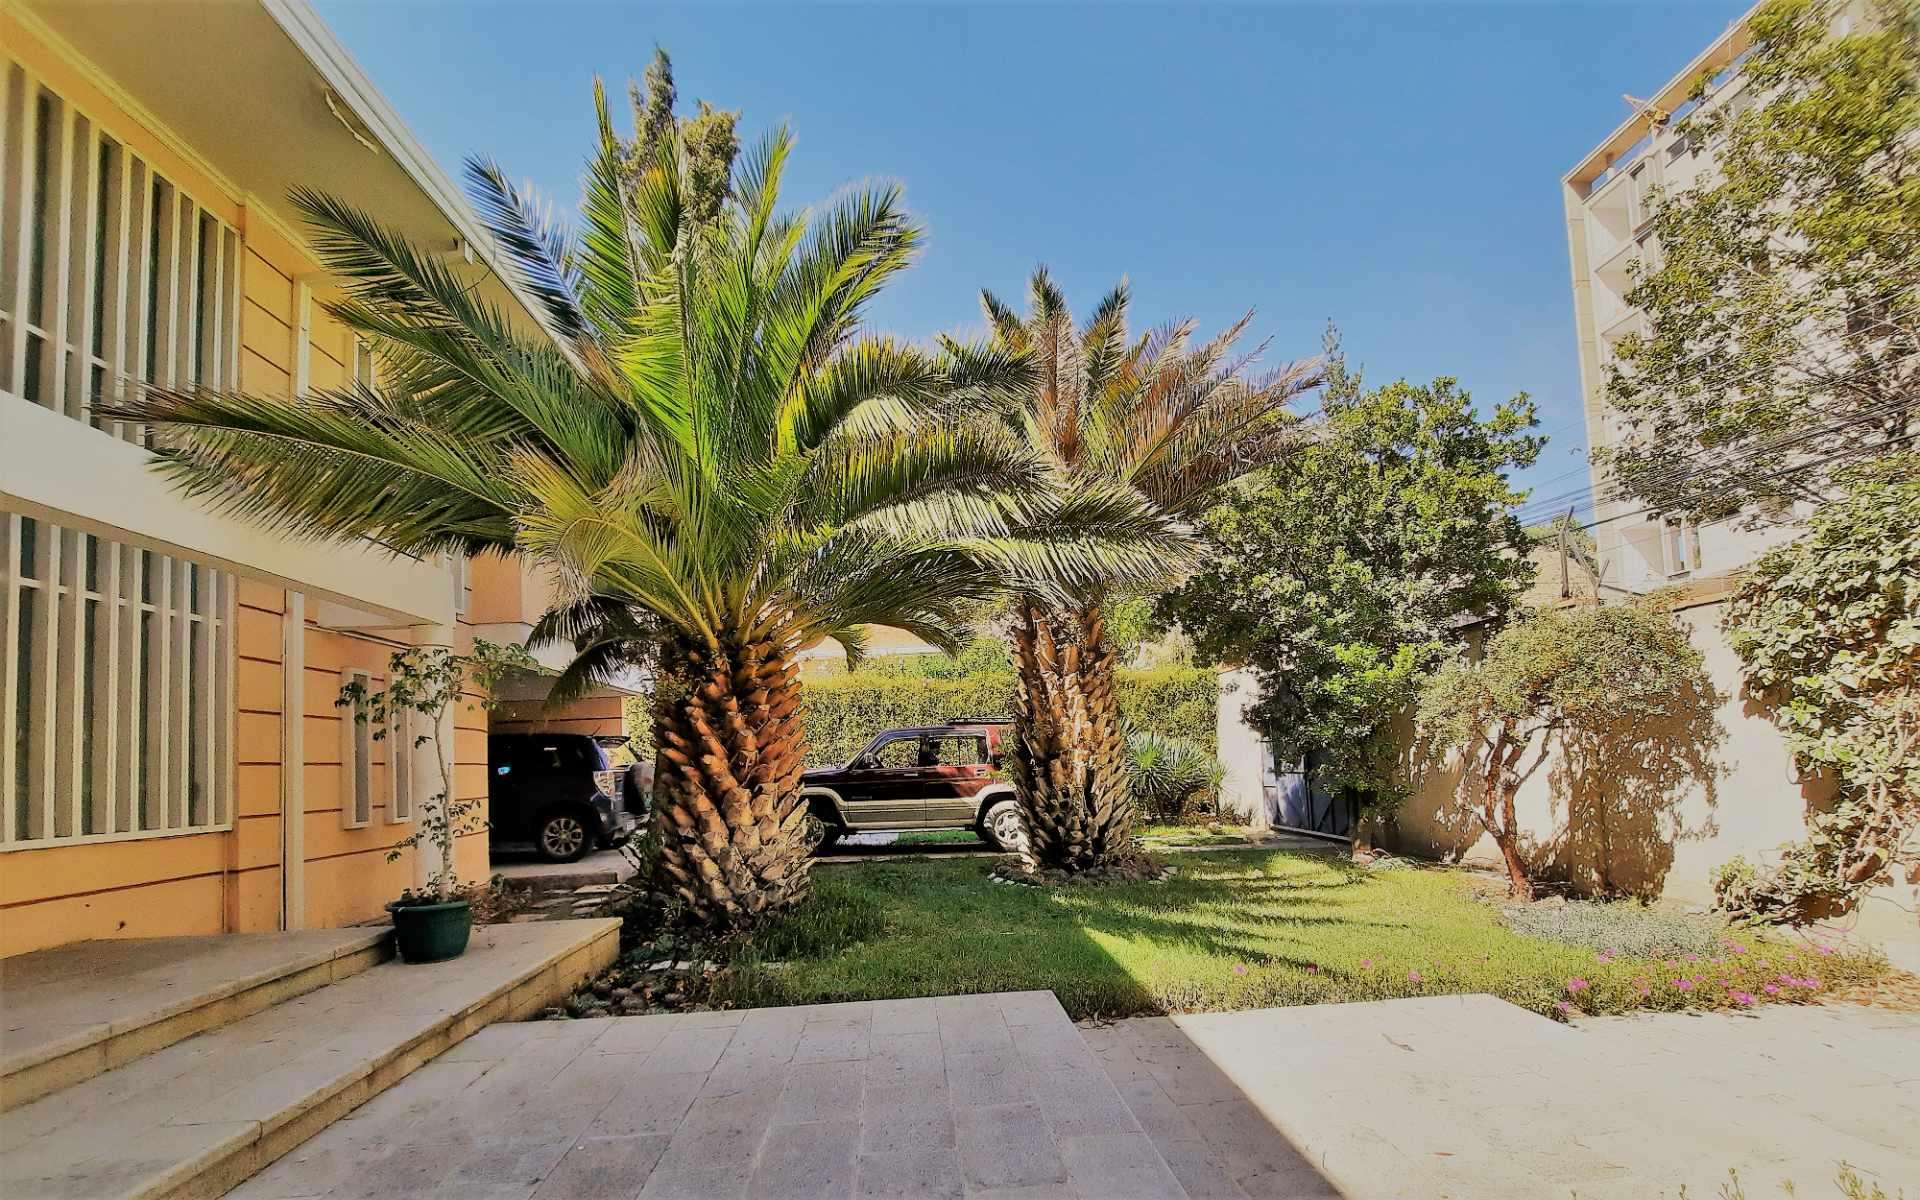 Casa en Alquiler Calle 10 de Calacoto casi esq Av. Costanera Foto 5